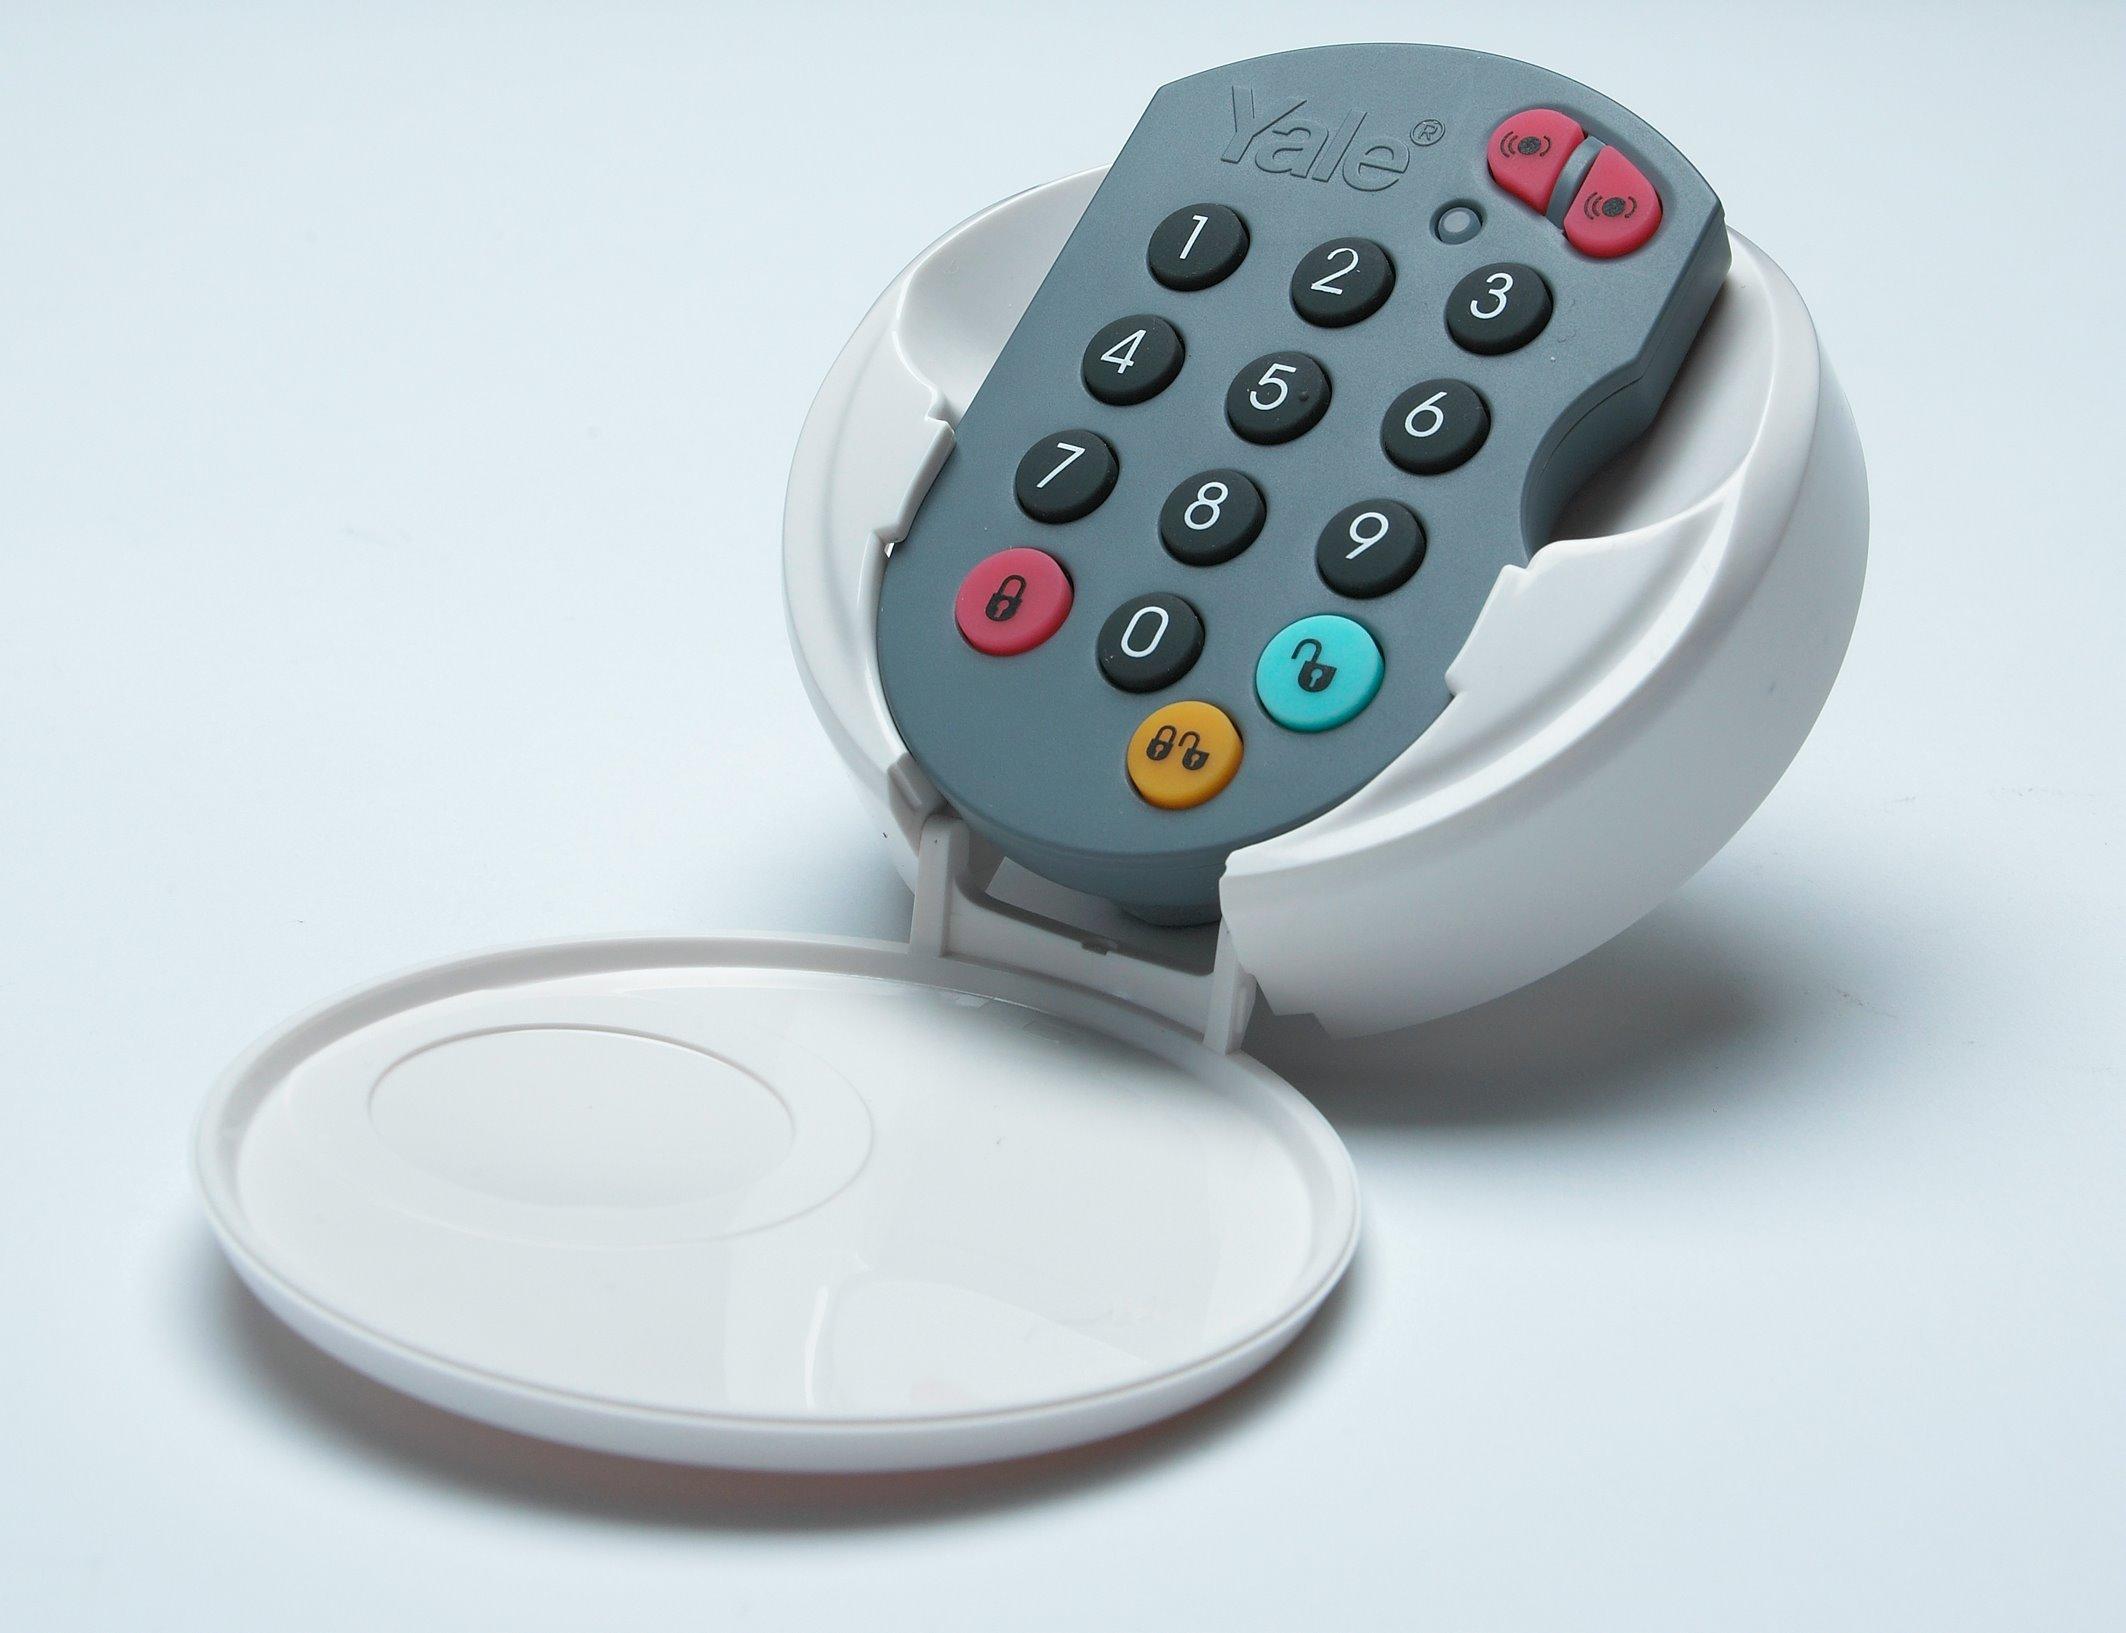 HSA6080 - Keypad Controller